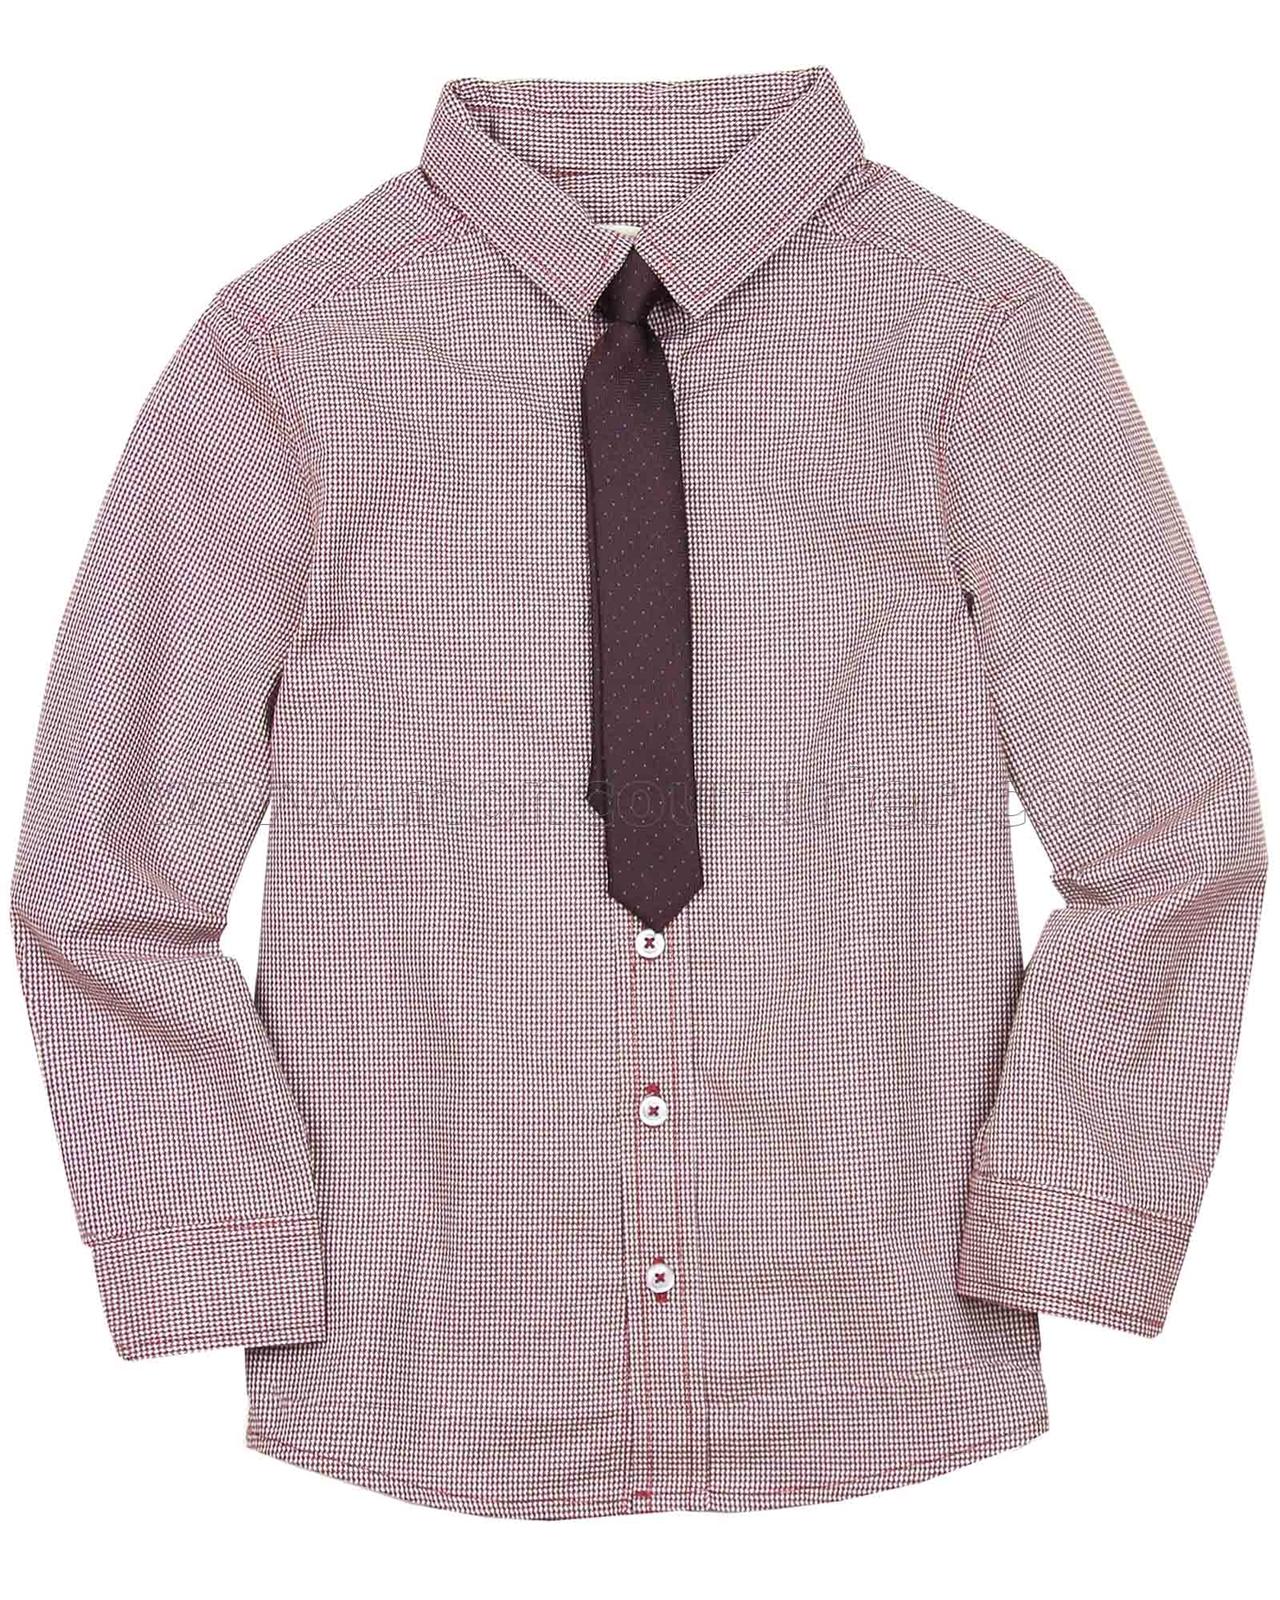 69742ae31 Deux par Deux Burgundy Shirt with Tie Maestro!